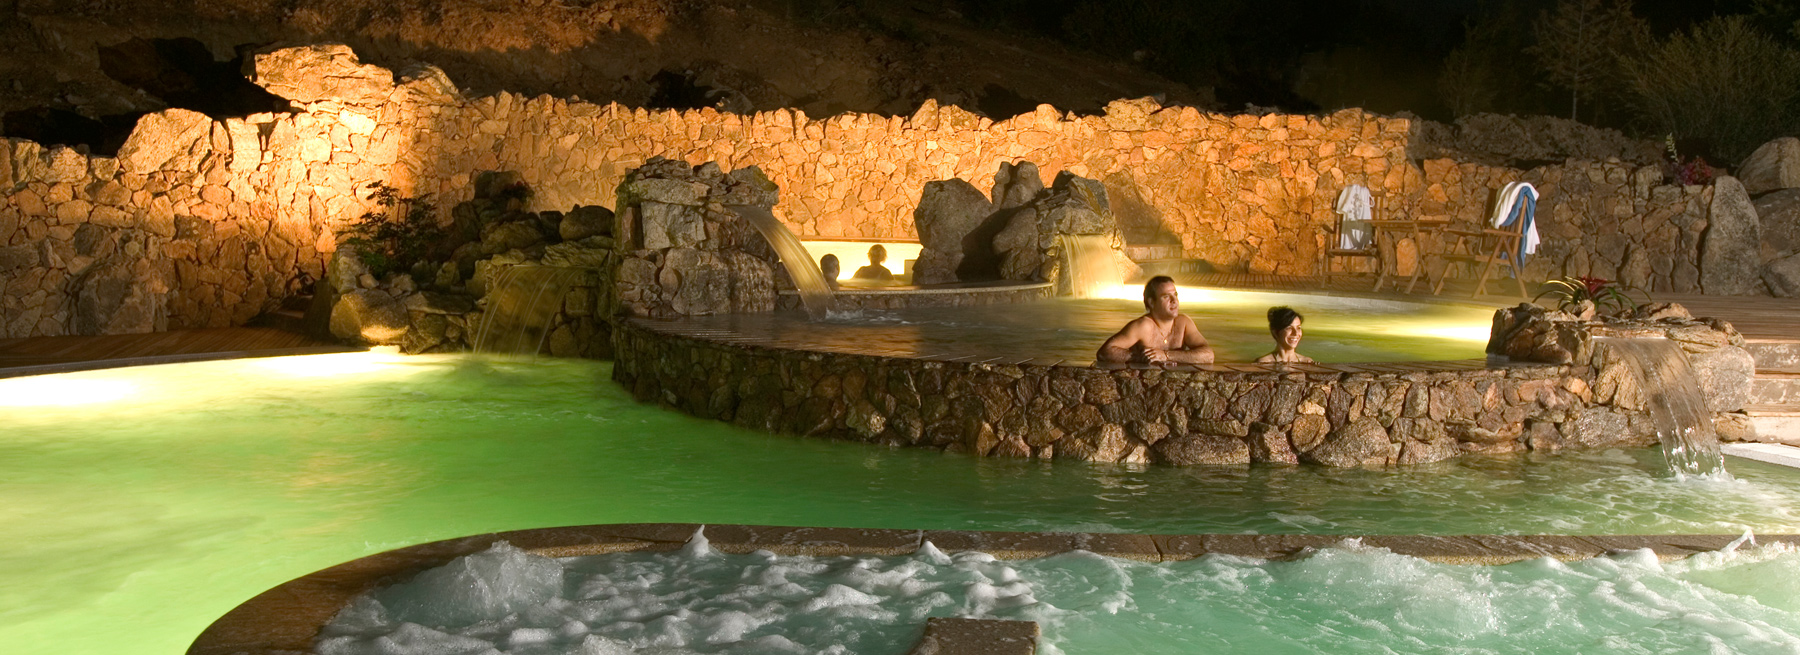 gruppo-delphina_slider_thalasso-centro-benessere-incantu-piscine-per-landing